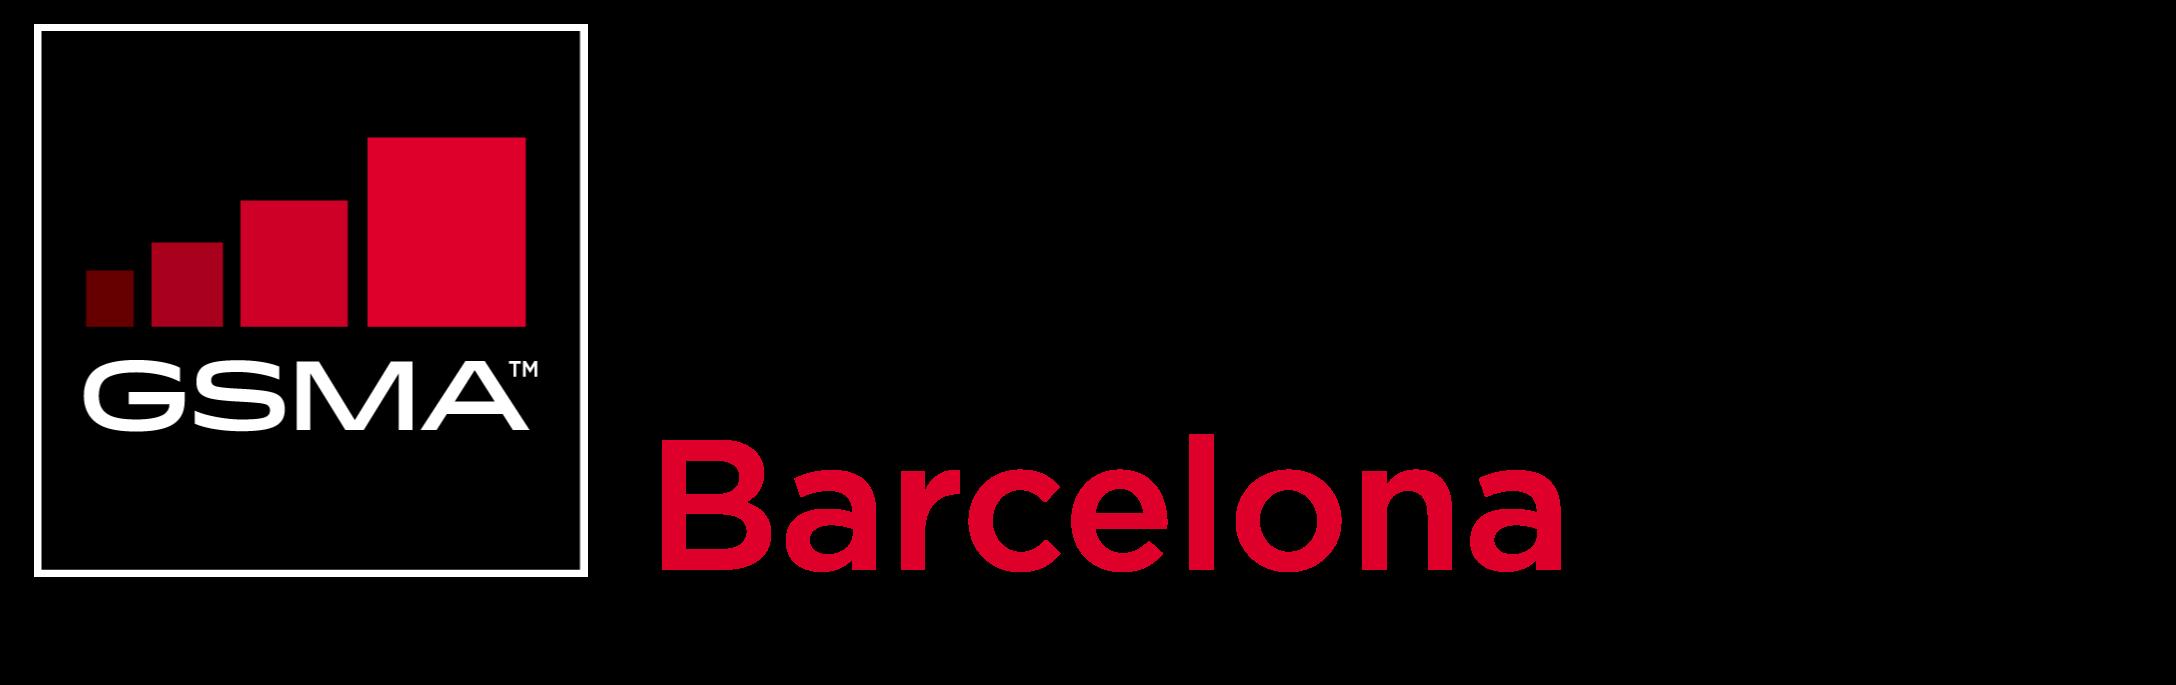 MWC Barcelona 2020 Logo